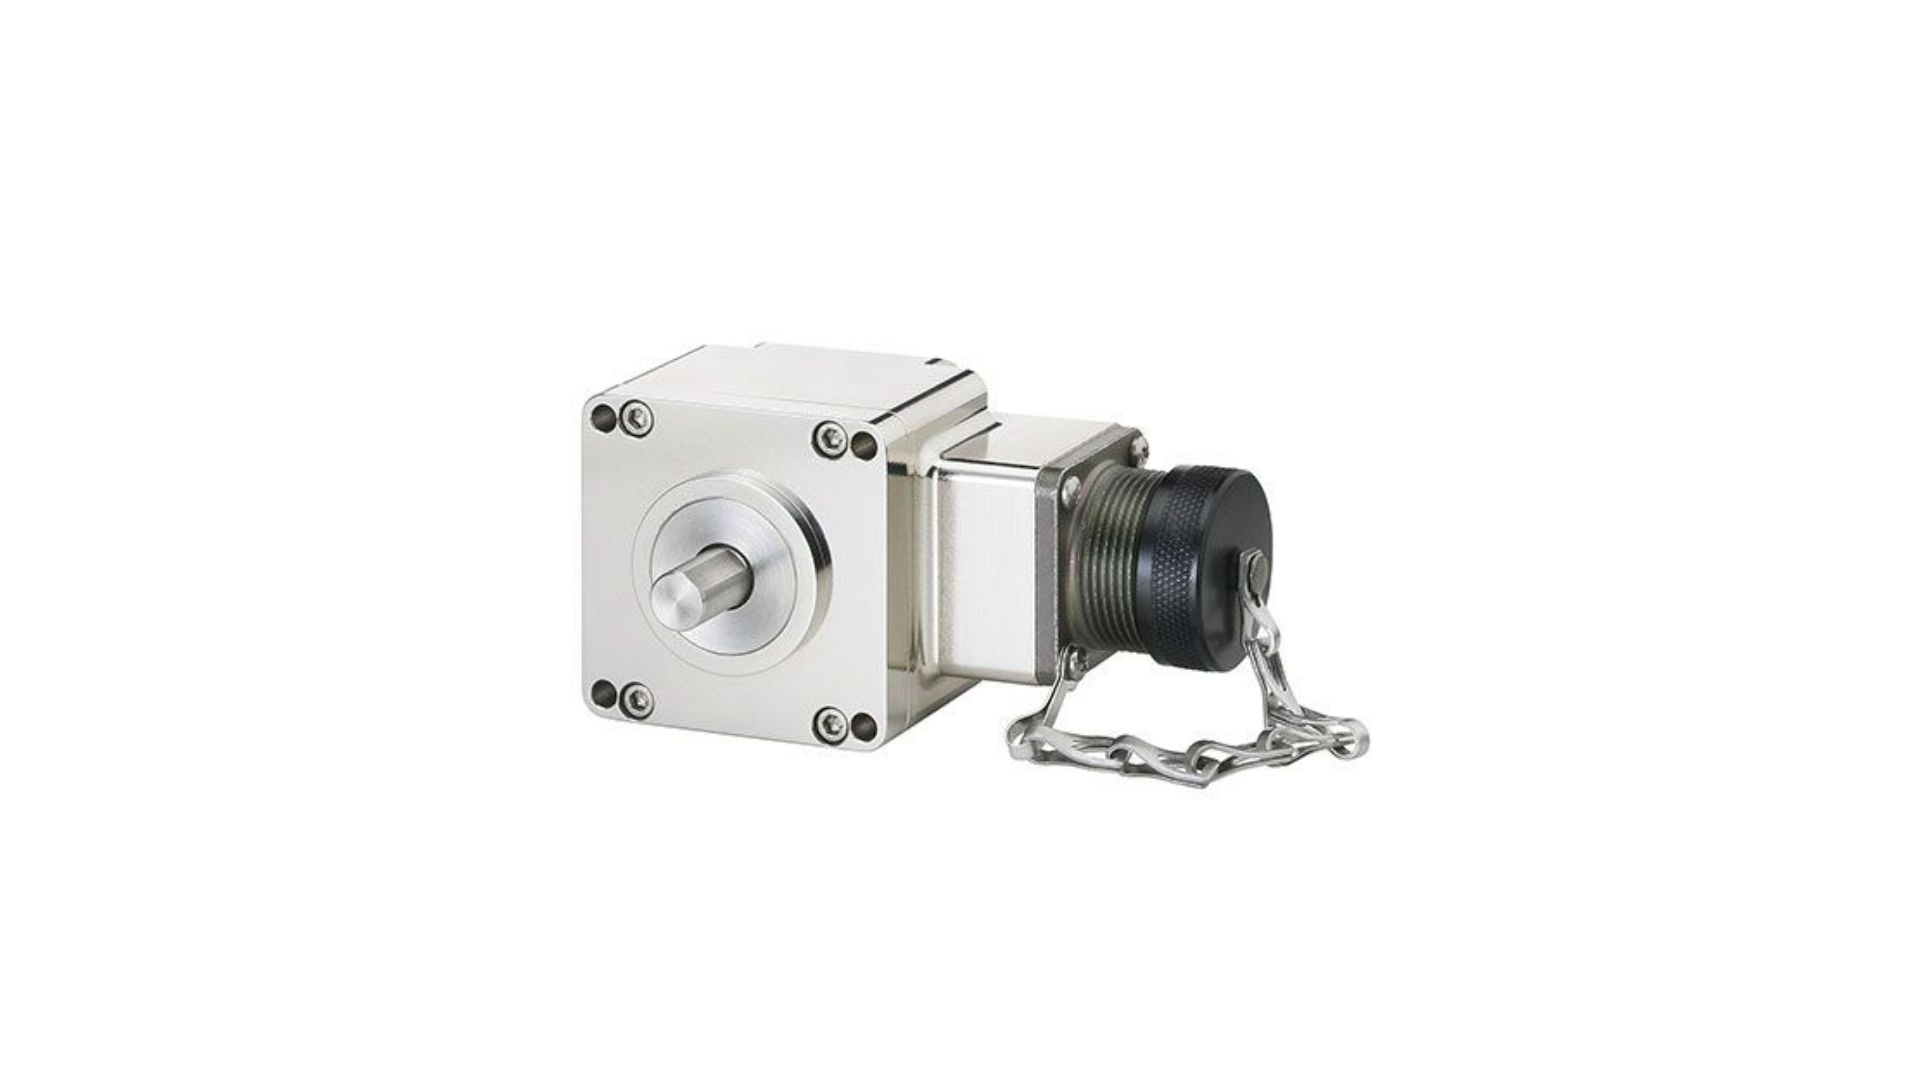 Hengstler Incremental Encoder HD 20